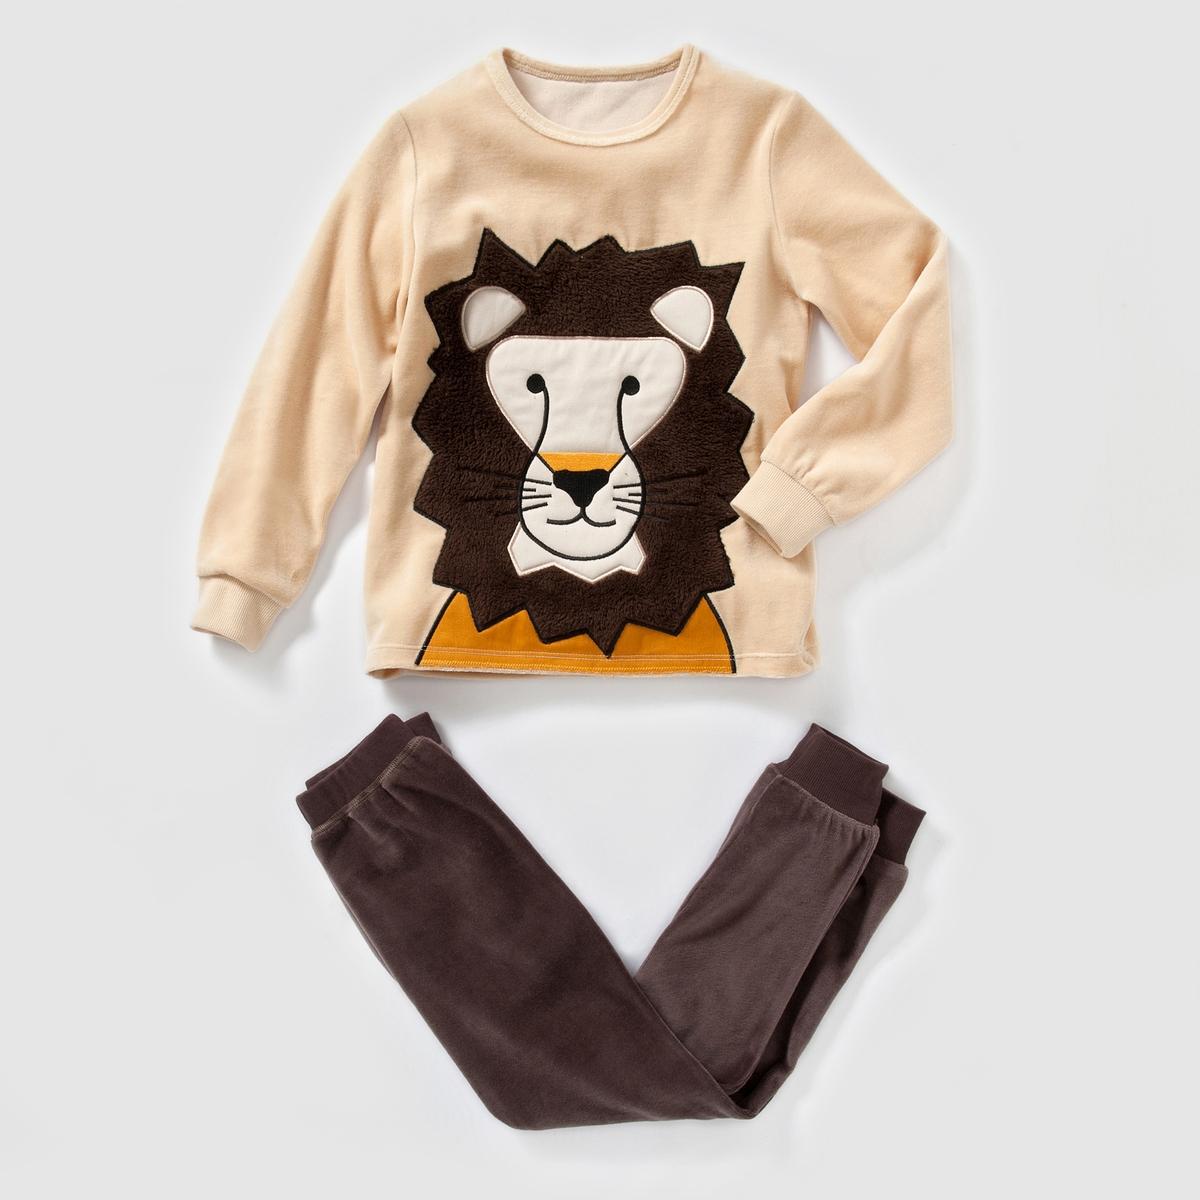 Пижама из велюра с рисунком лев, 2-12 лет